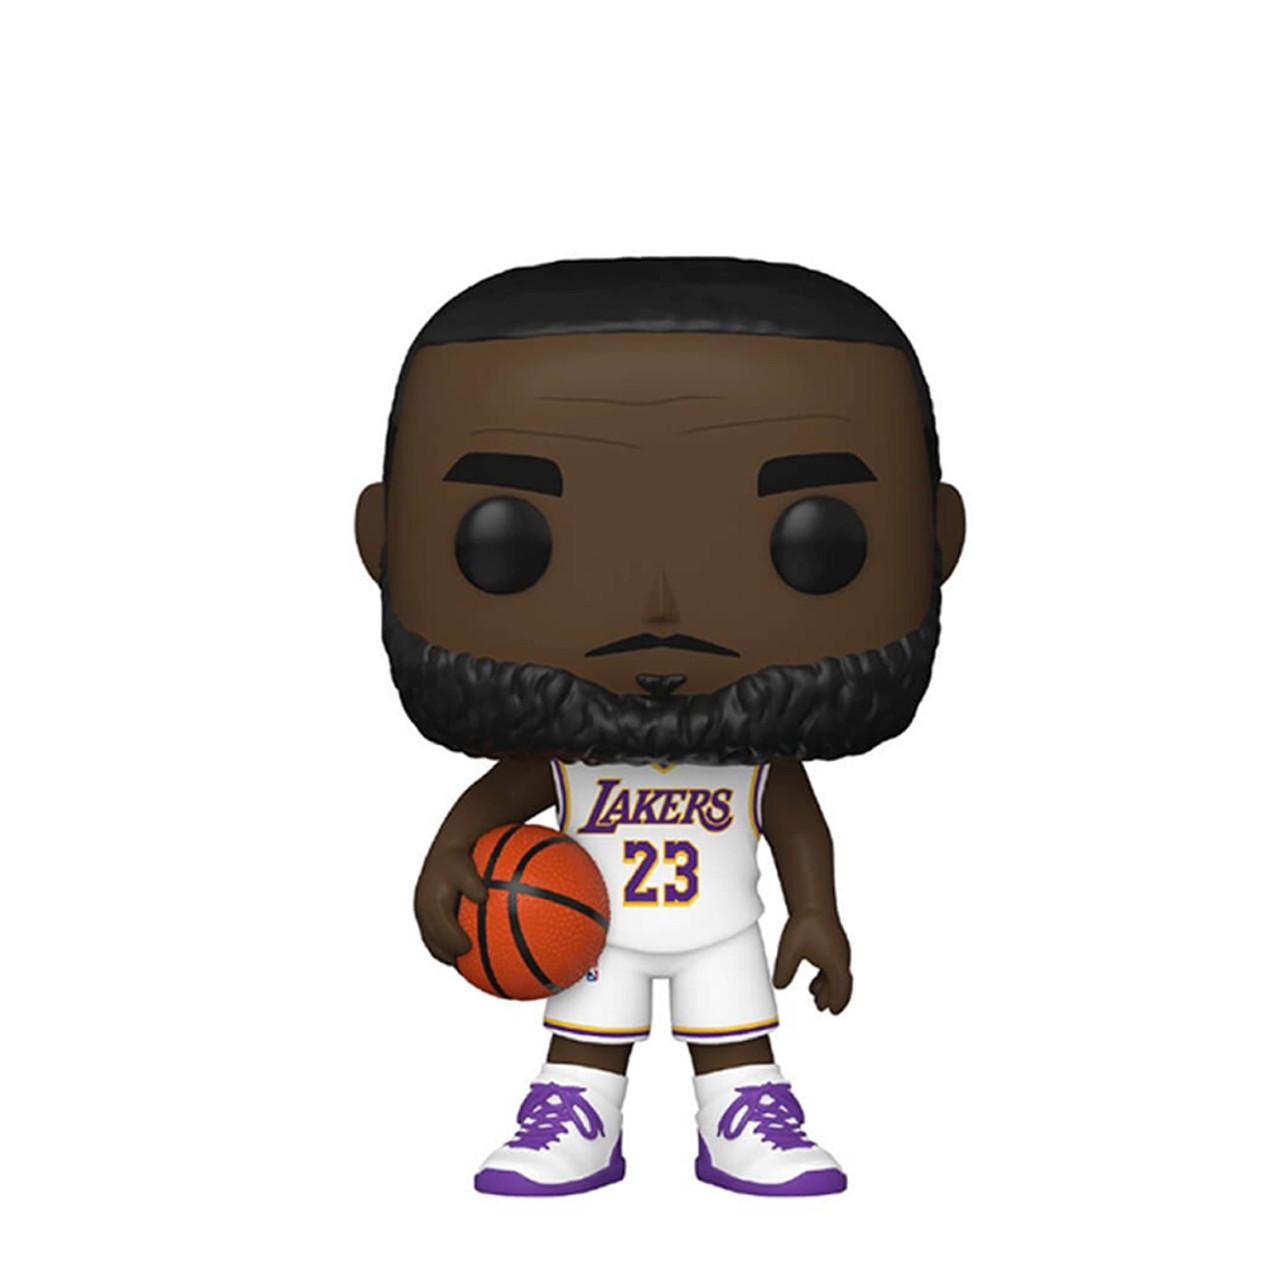 LeBron James (Los Angeles Lakers) Alternate Jersey Funko Pop! Series 5